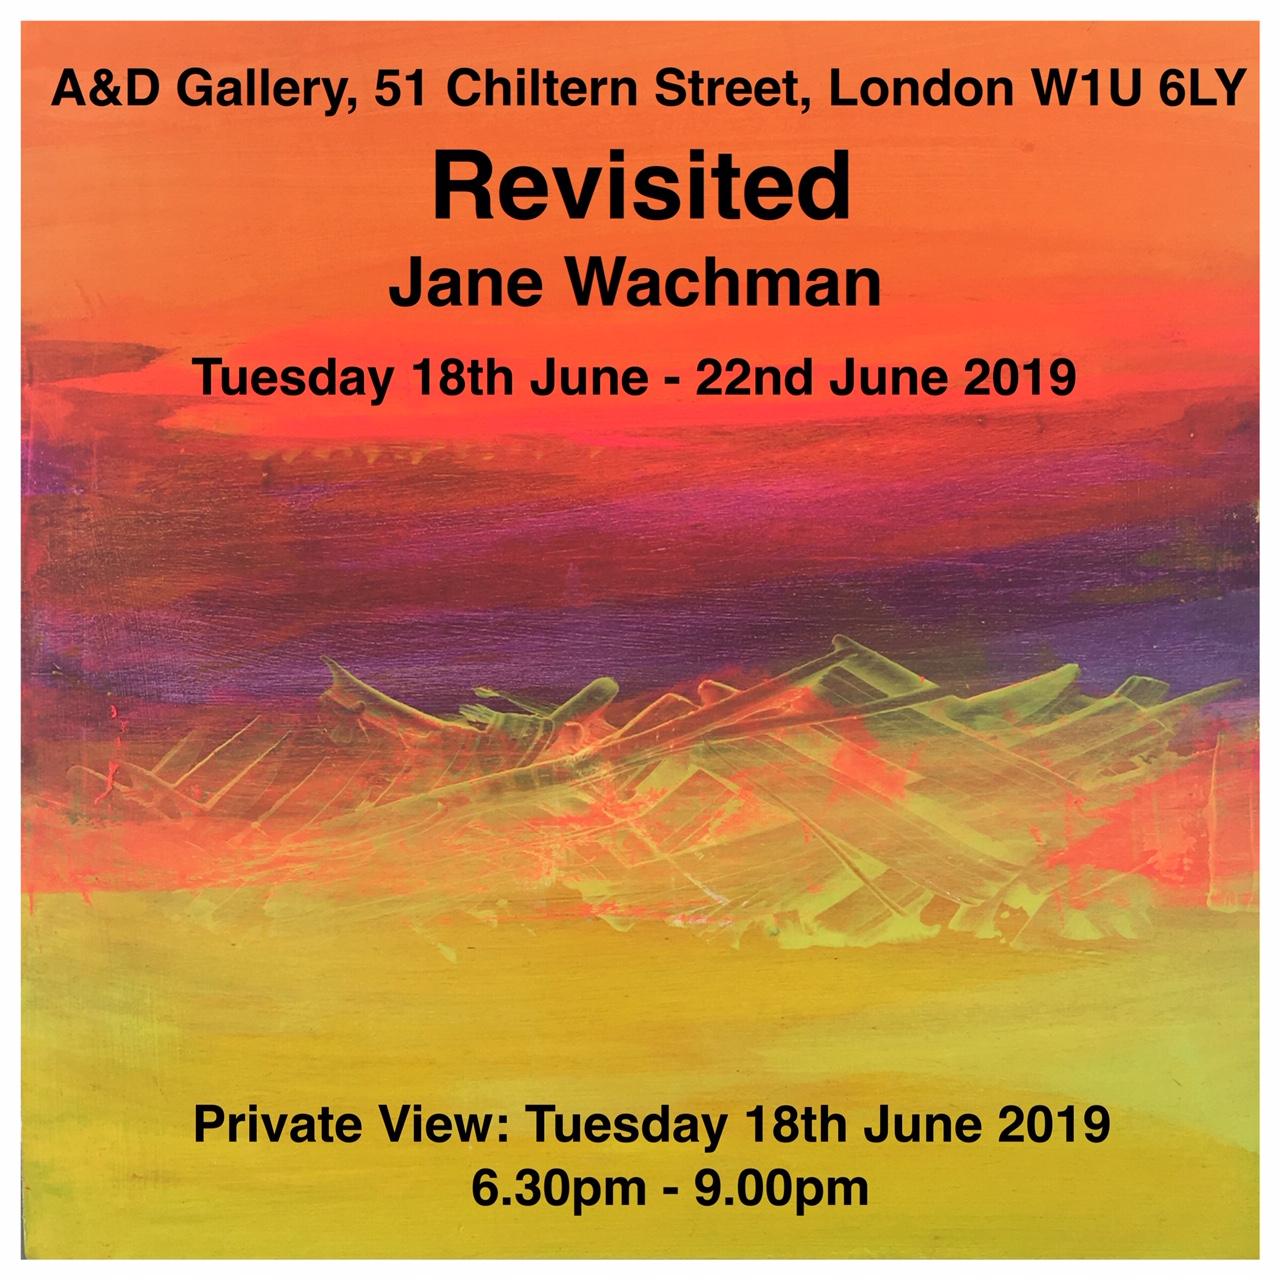 Jane Wachman